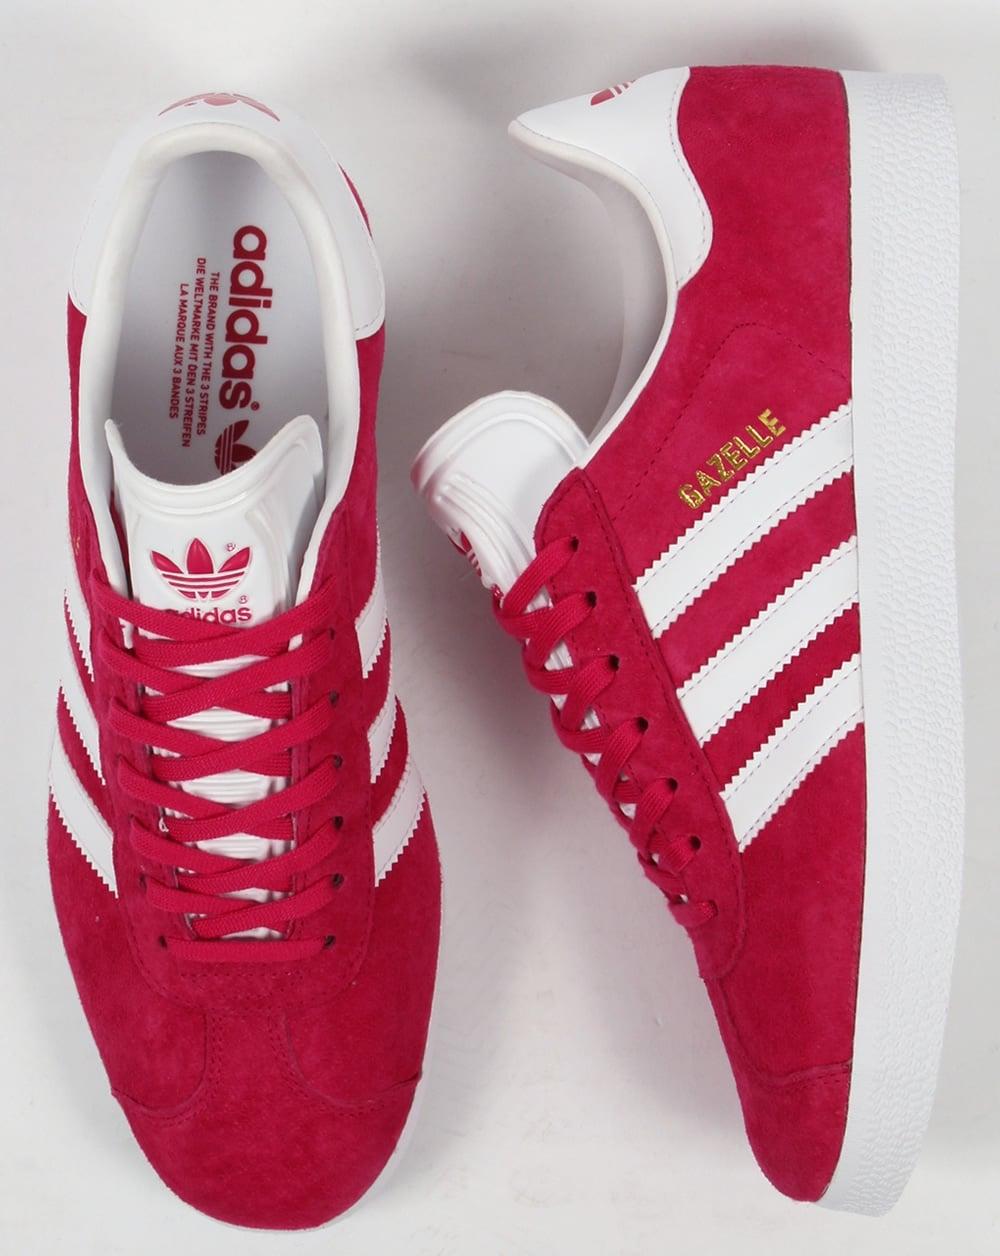 nouveau style e06e5 17182 Adidas Gazelle Trainers Bold Pink/White